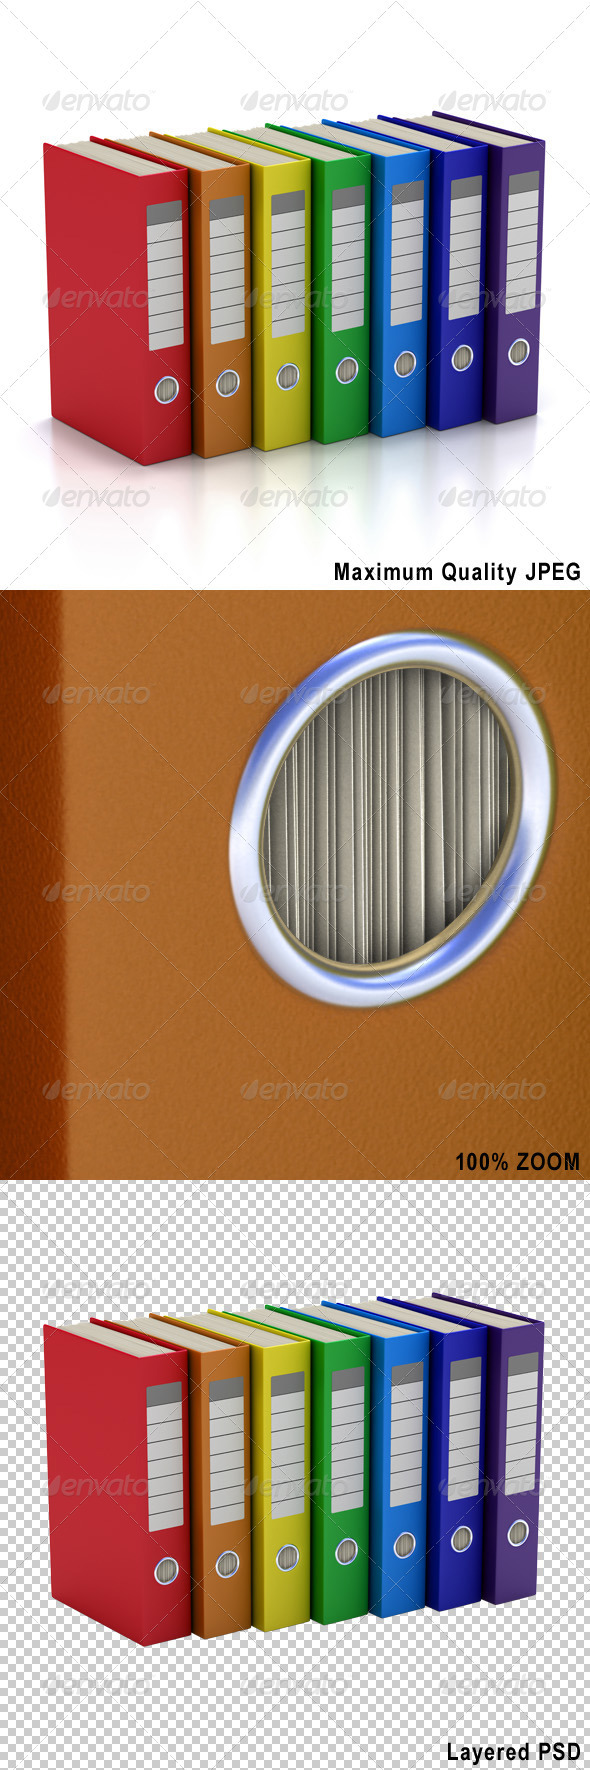 Seven Colorful File Folders - Objects 3D Renders